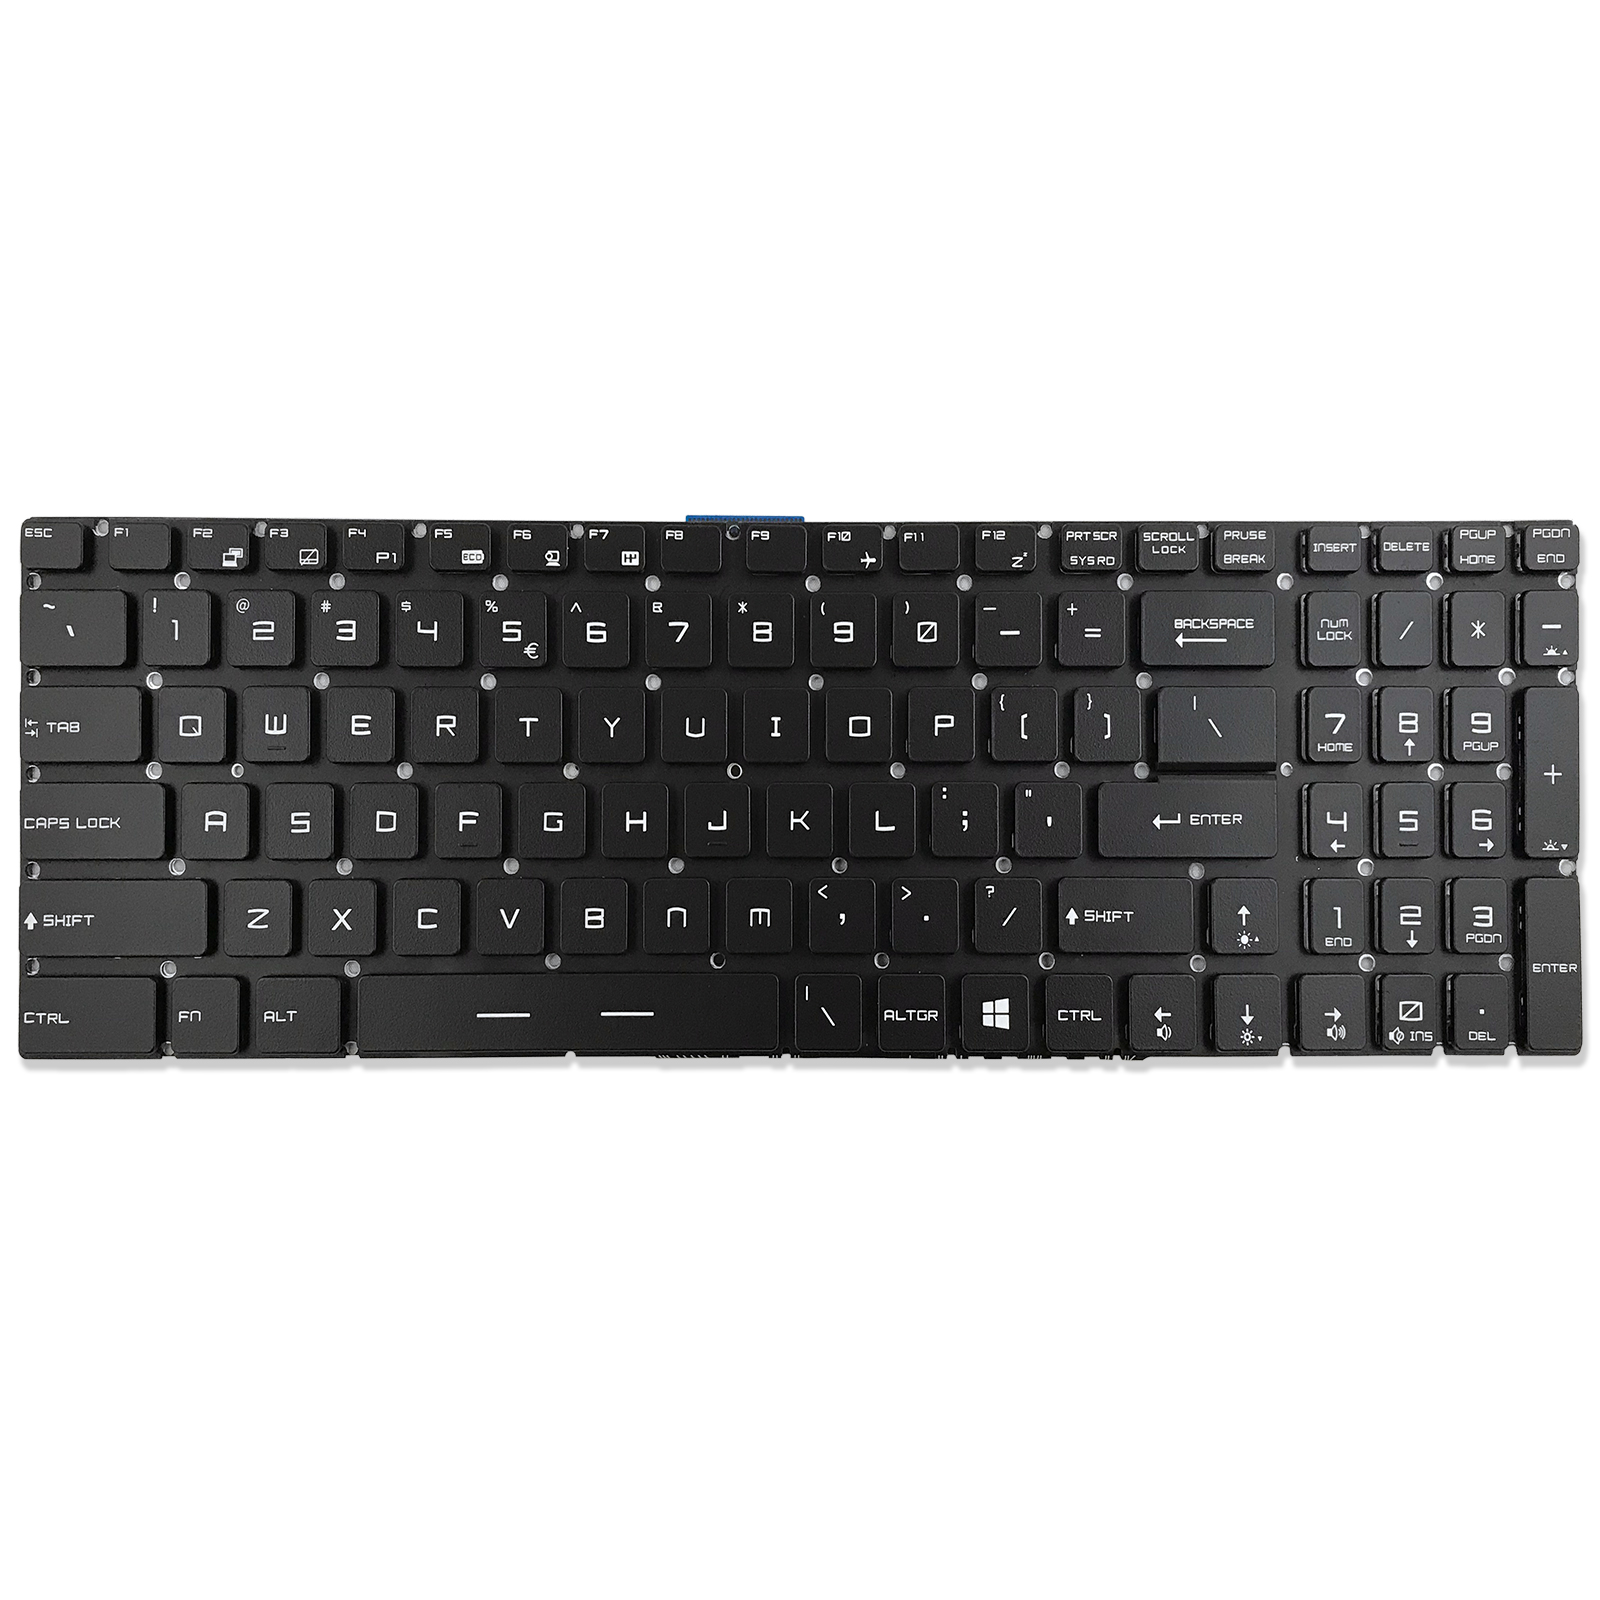 New MSI Steel Series GE62 GE72 GT72 GS60 GS70 MS-1781 MS-16J1 MS-16J2 Gaming Laptop US Keyboard Full RGB Backlit Crystal Keys